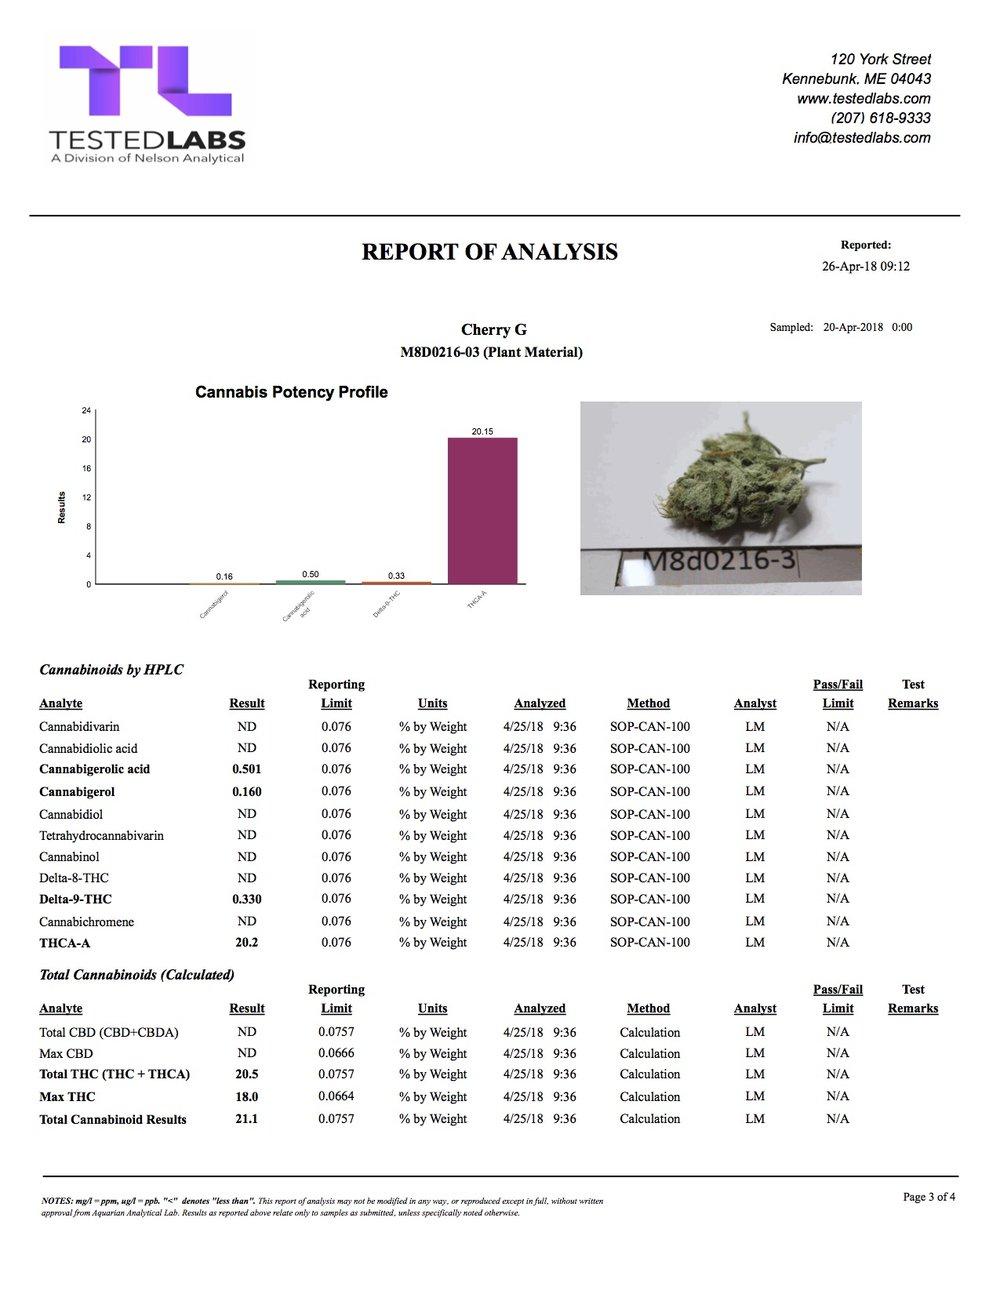 Cherrygasm Lab results.jpg